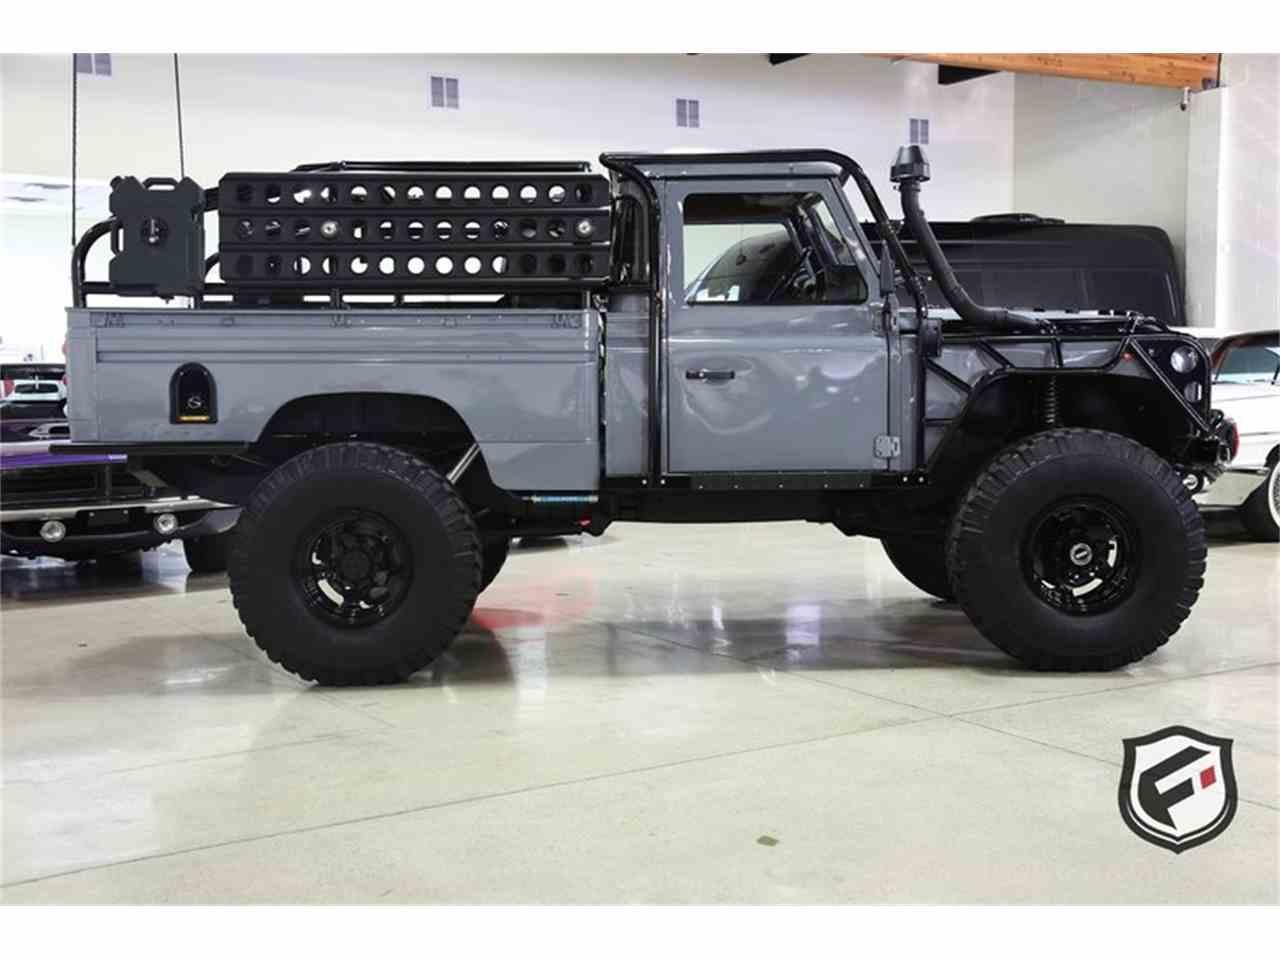 1984 land rover defender 110 high capacity pickup truck for sale cc 945092. Black Bedroom Furniture Sets. Home Design Ideas